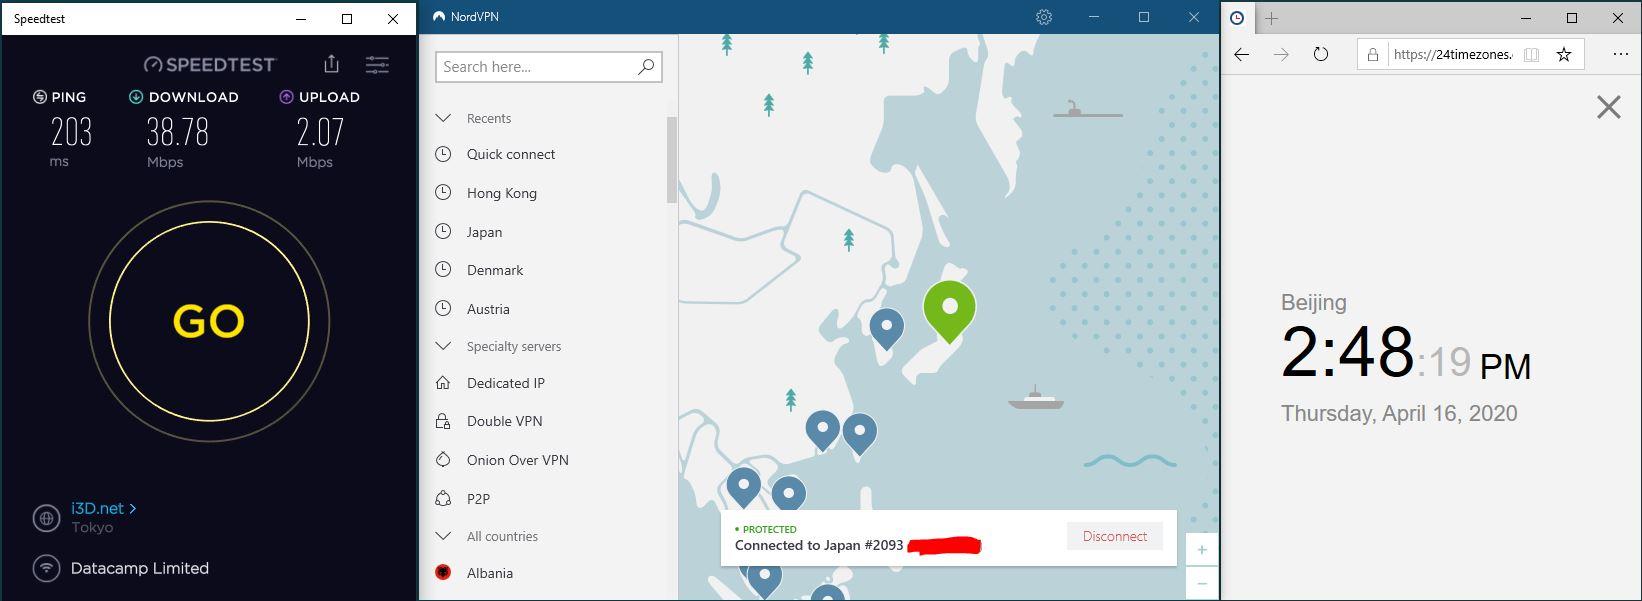 Windows10 NordVPN Japan #2093 中国VPN 翻墙 科学上网 SpeedTest测速-20200416